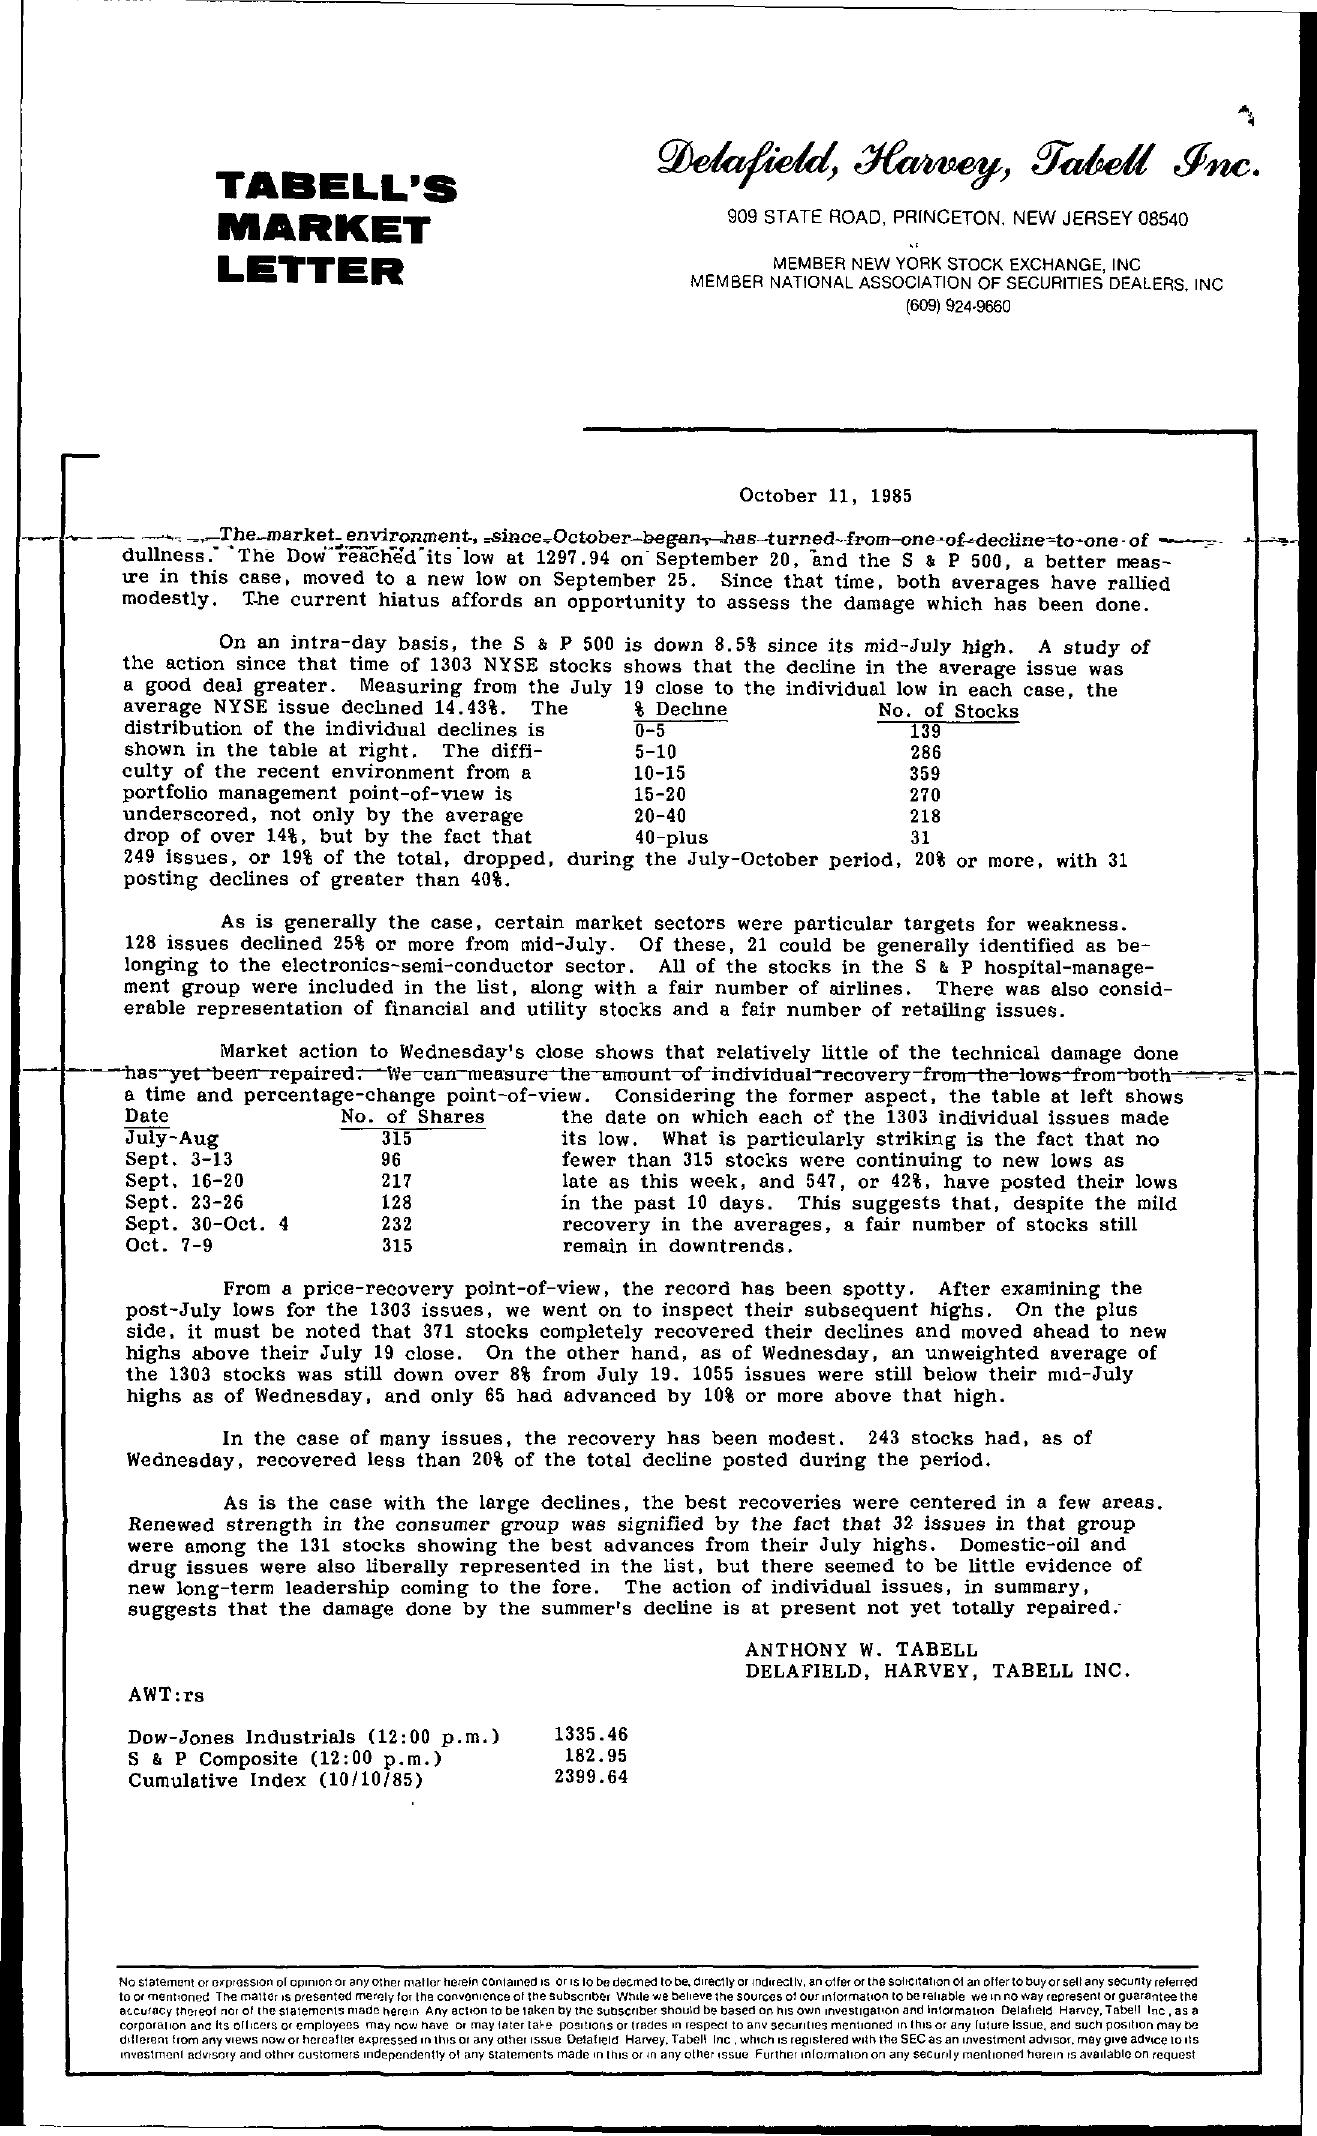 Tabell's Market Letter - October 11, 1985